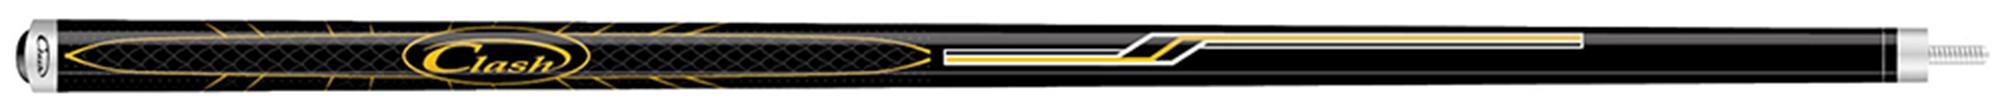 PK0646-3: Clash Nano 1 geel 12,75mm 19/20oz #1